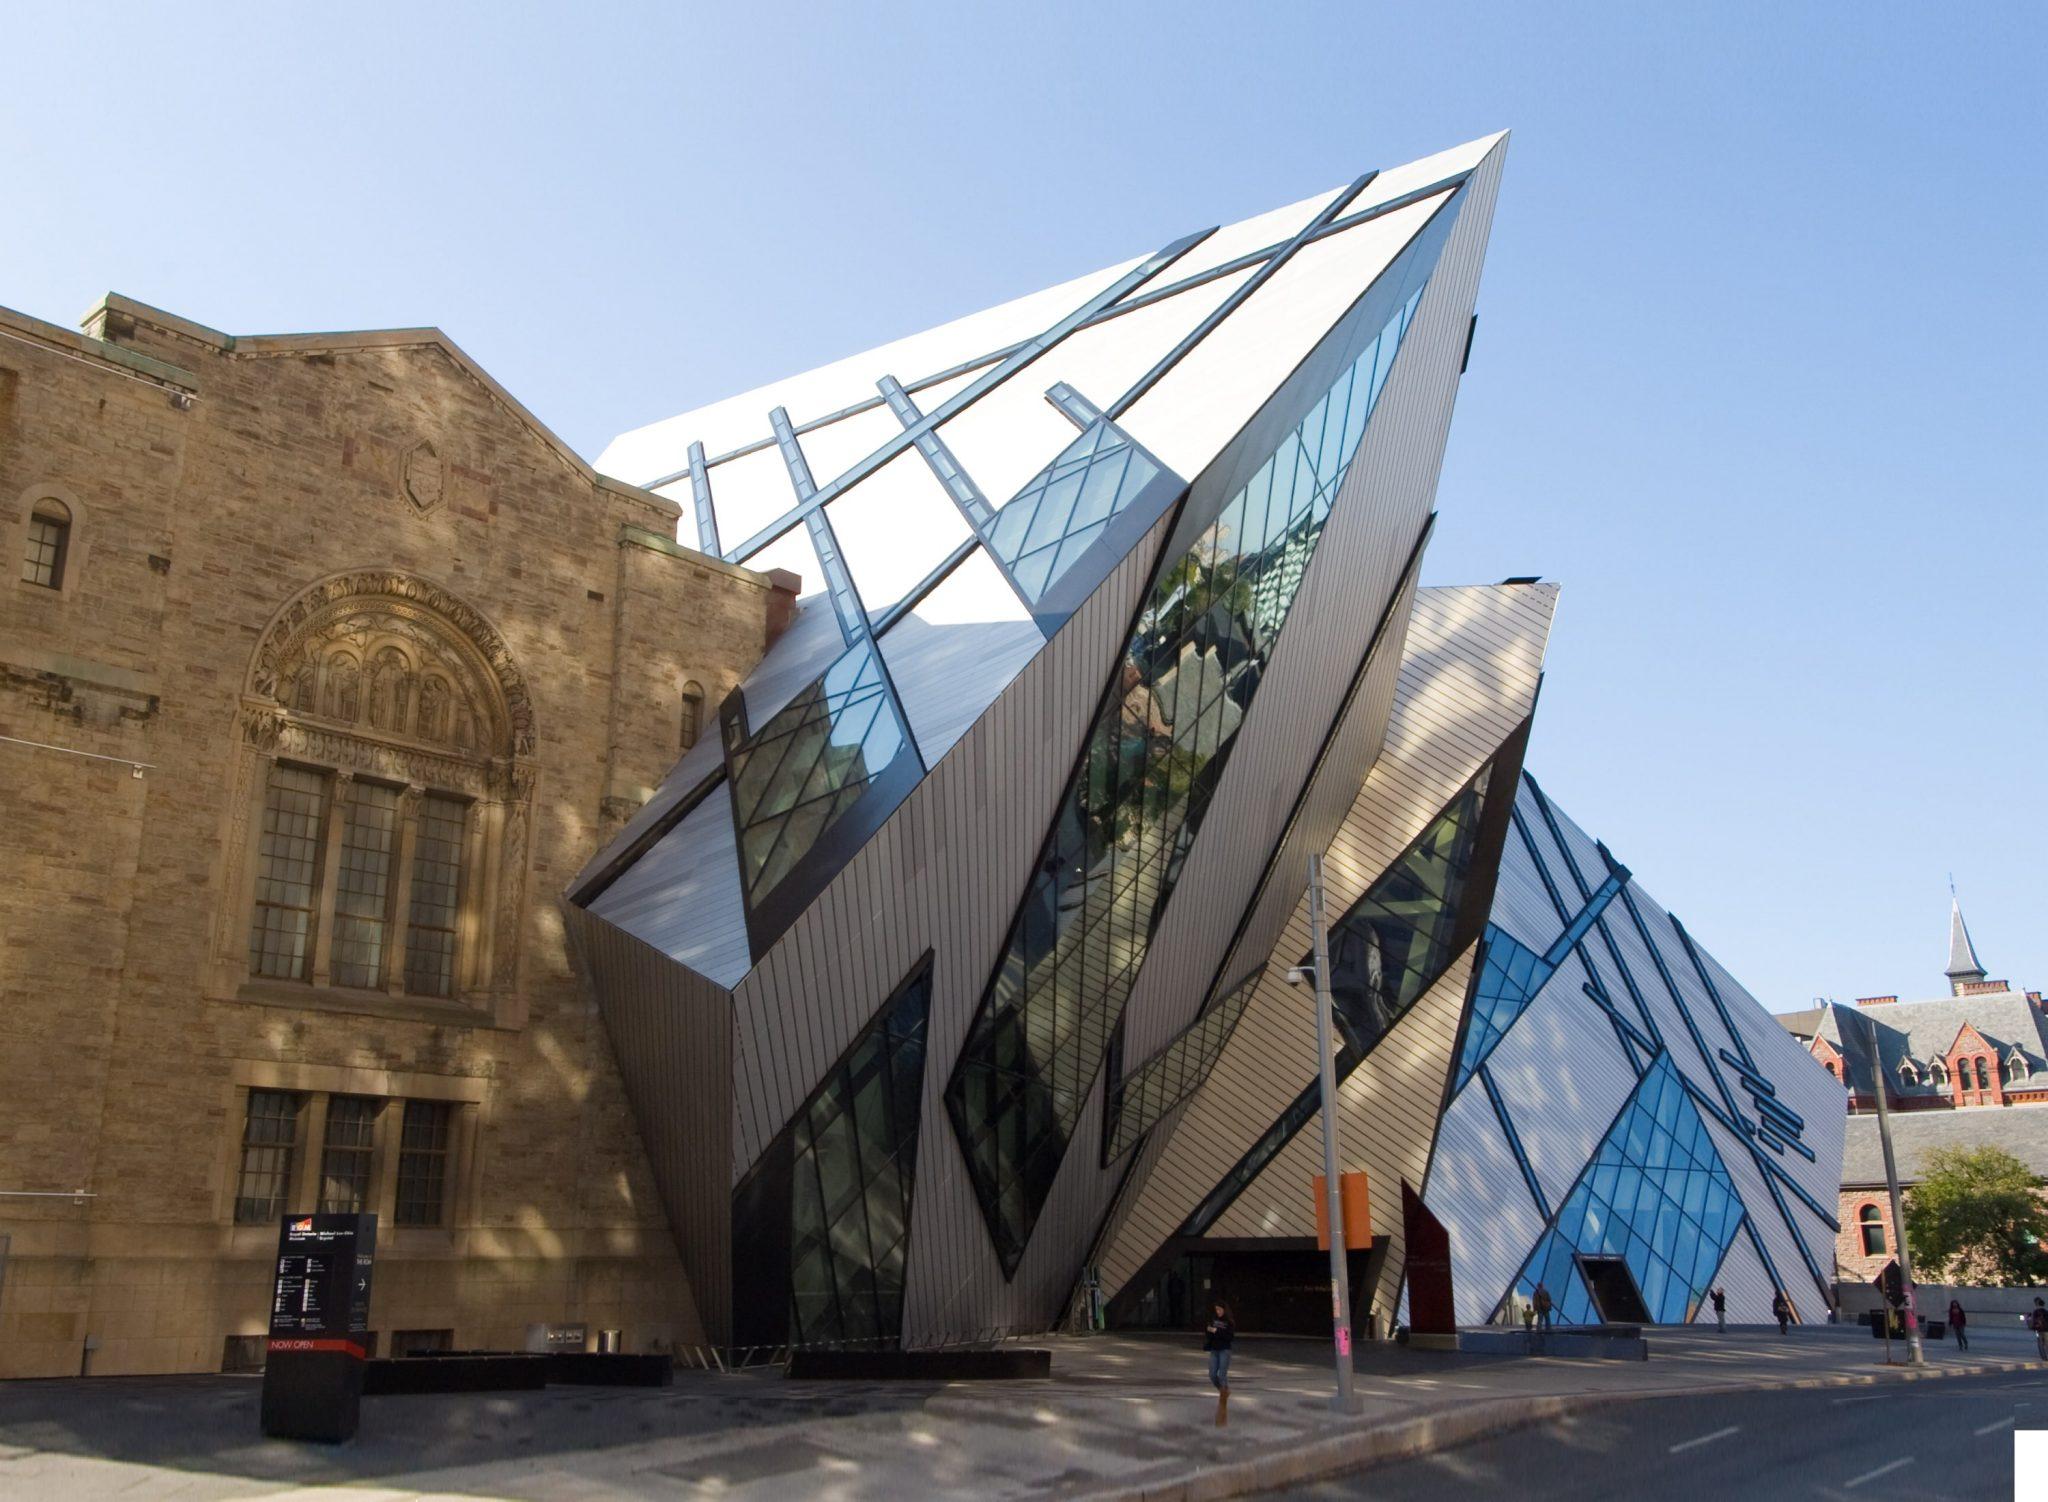 دنیل لیبسکیند Royal Ontario Museum